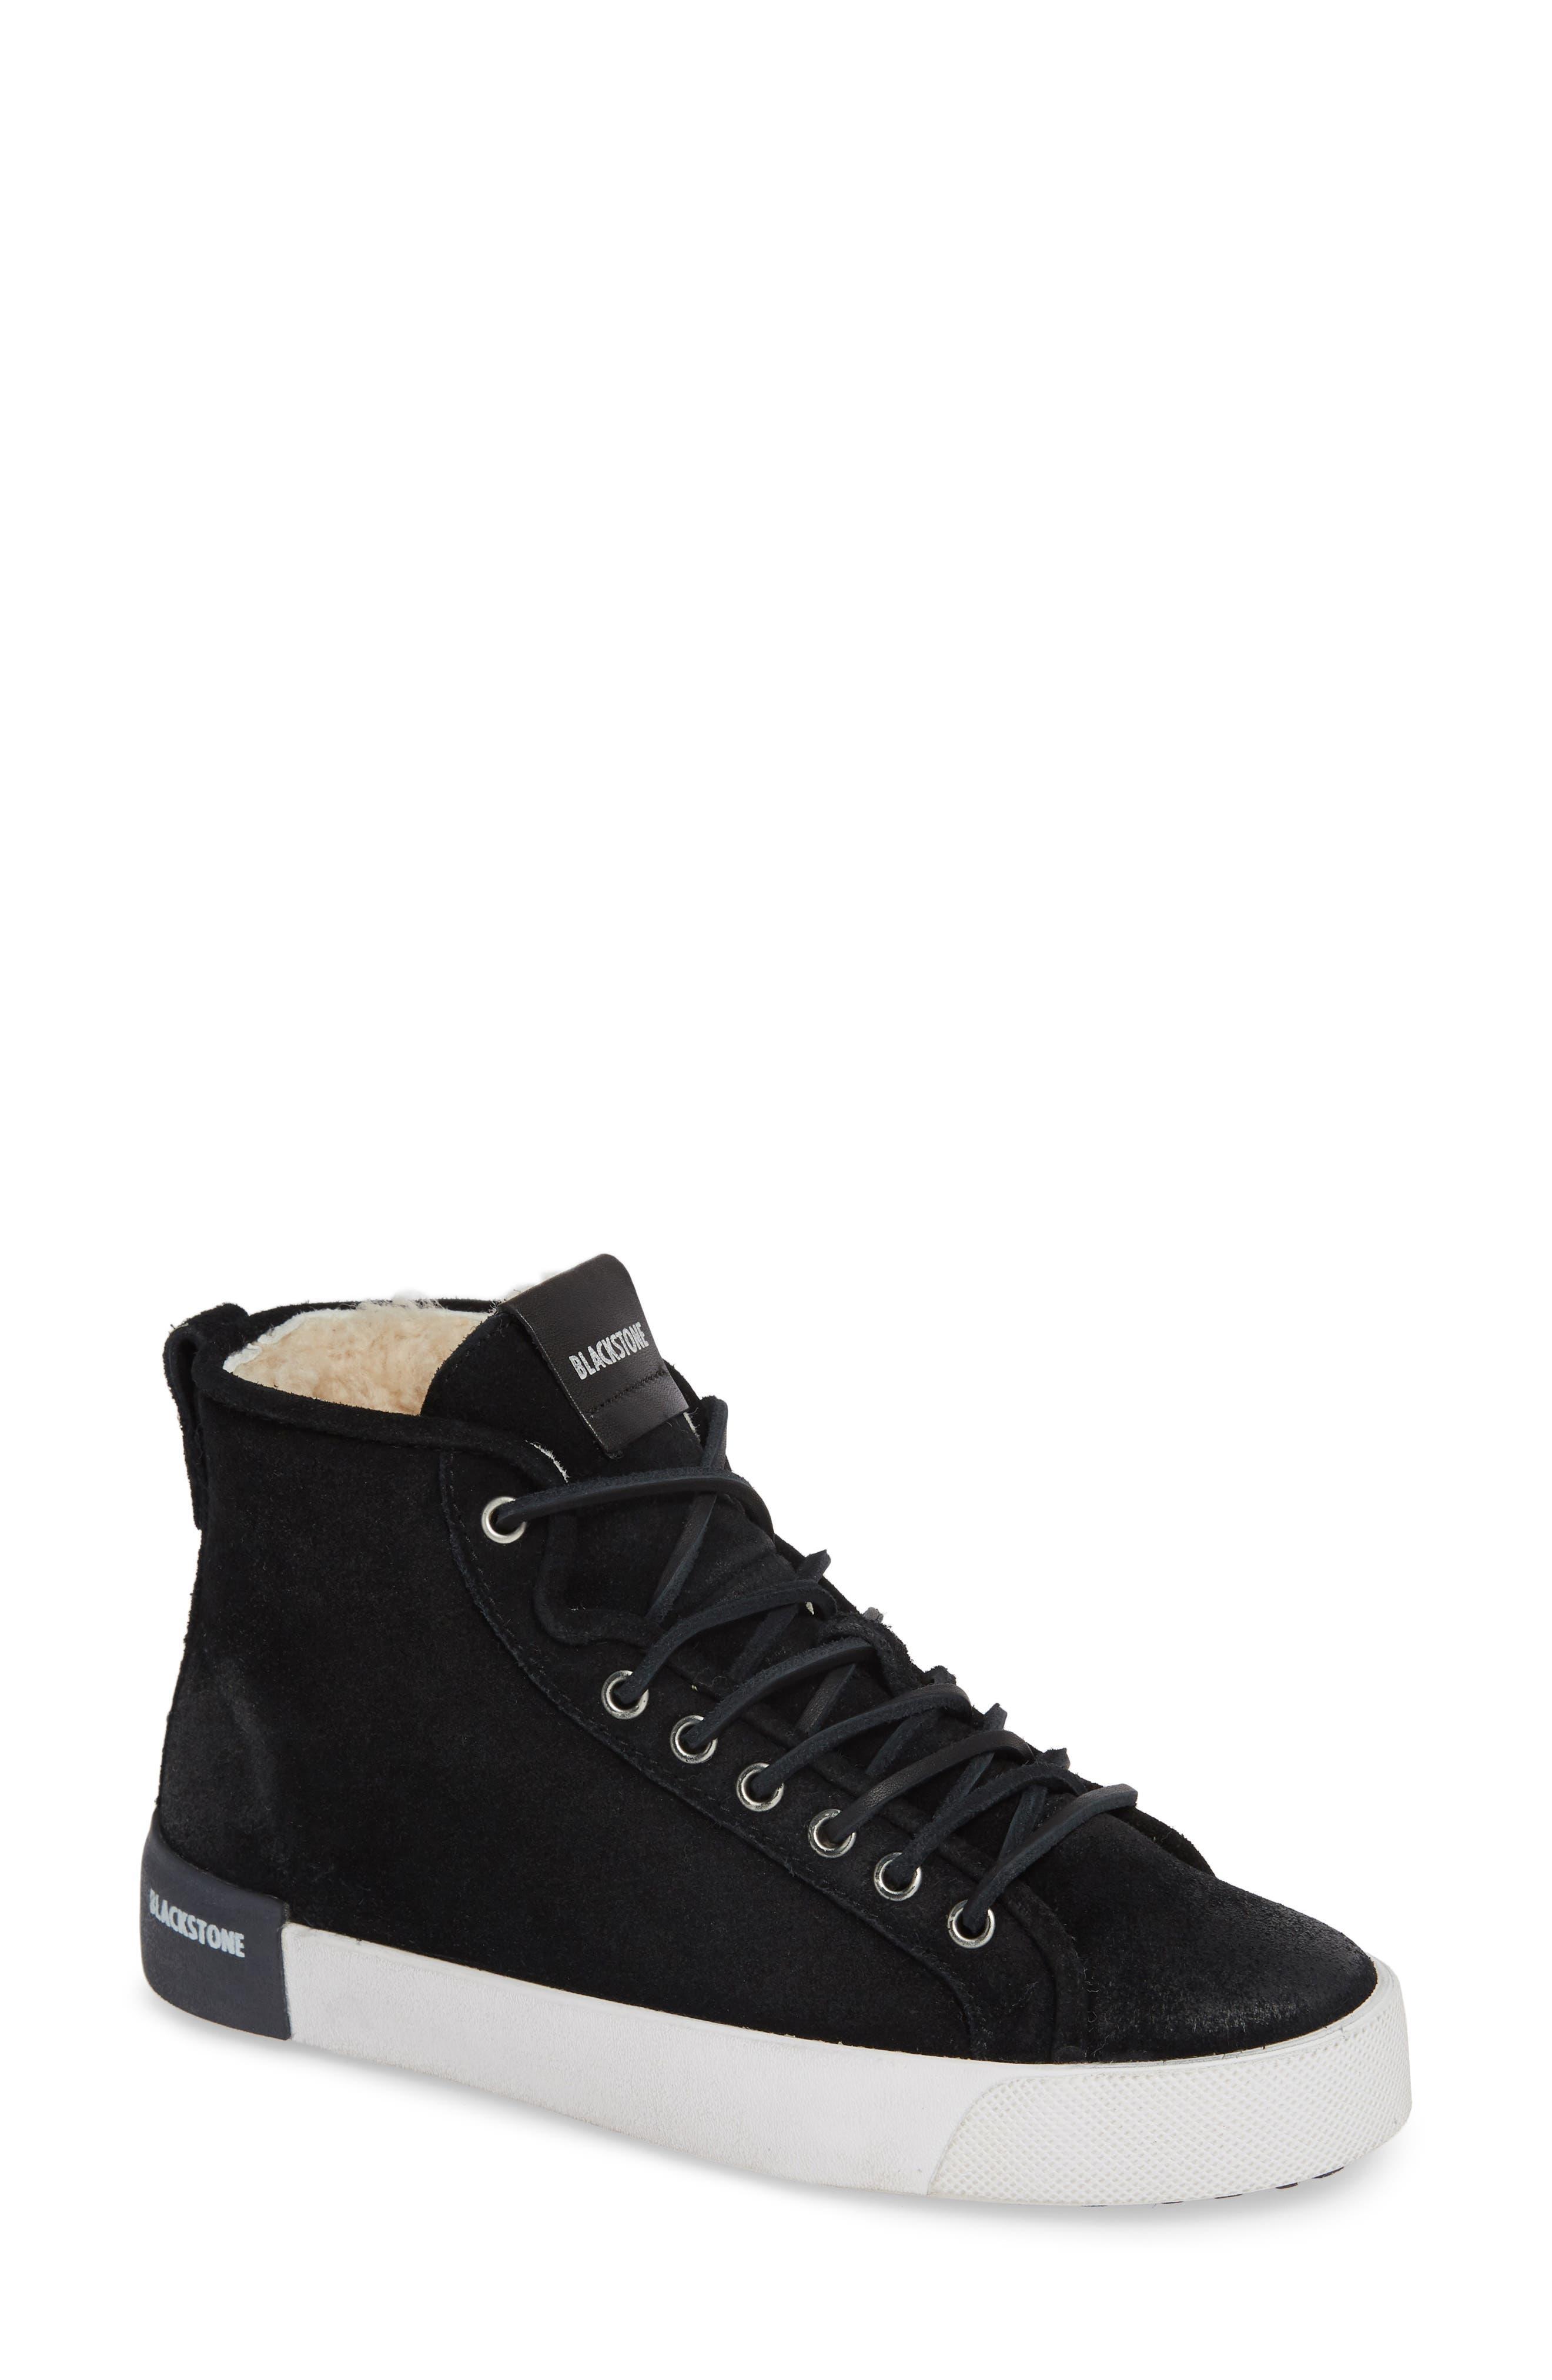 Blackstone Ql70 Genuine Shearling Lined Sneaker, Black